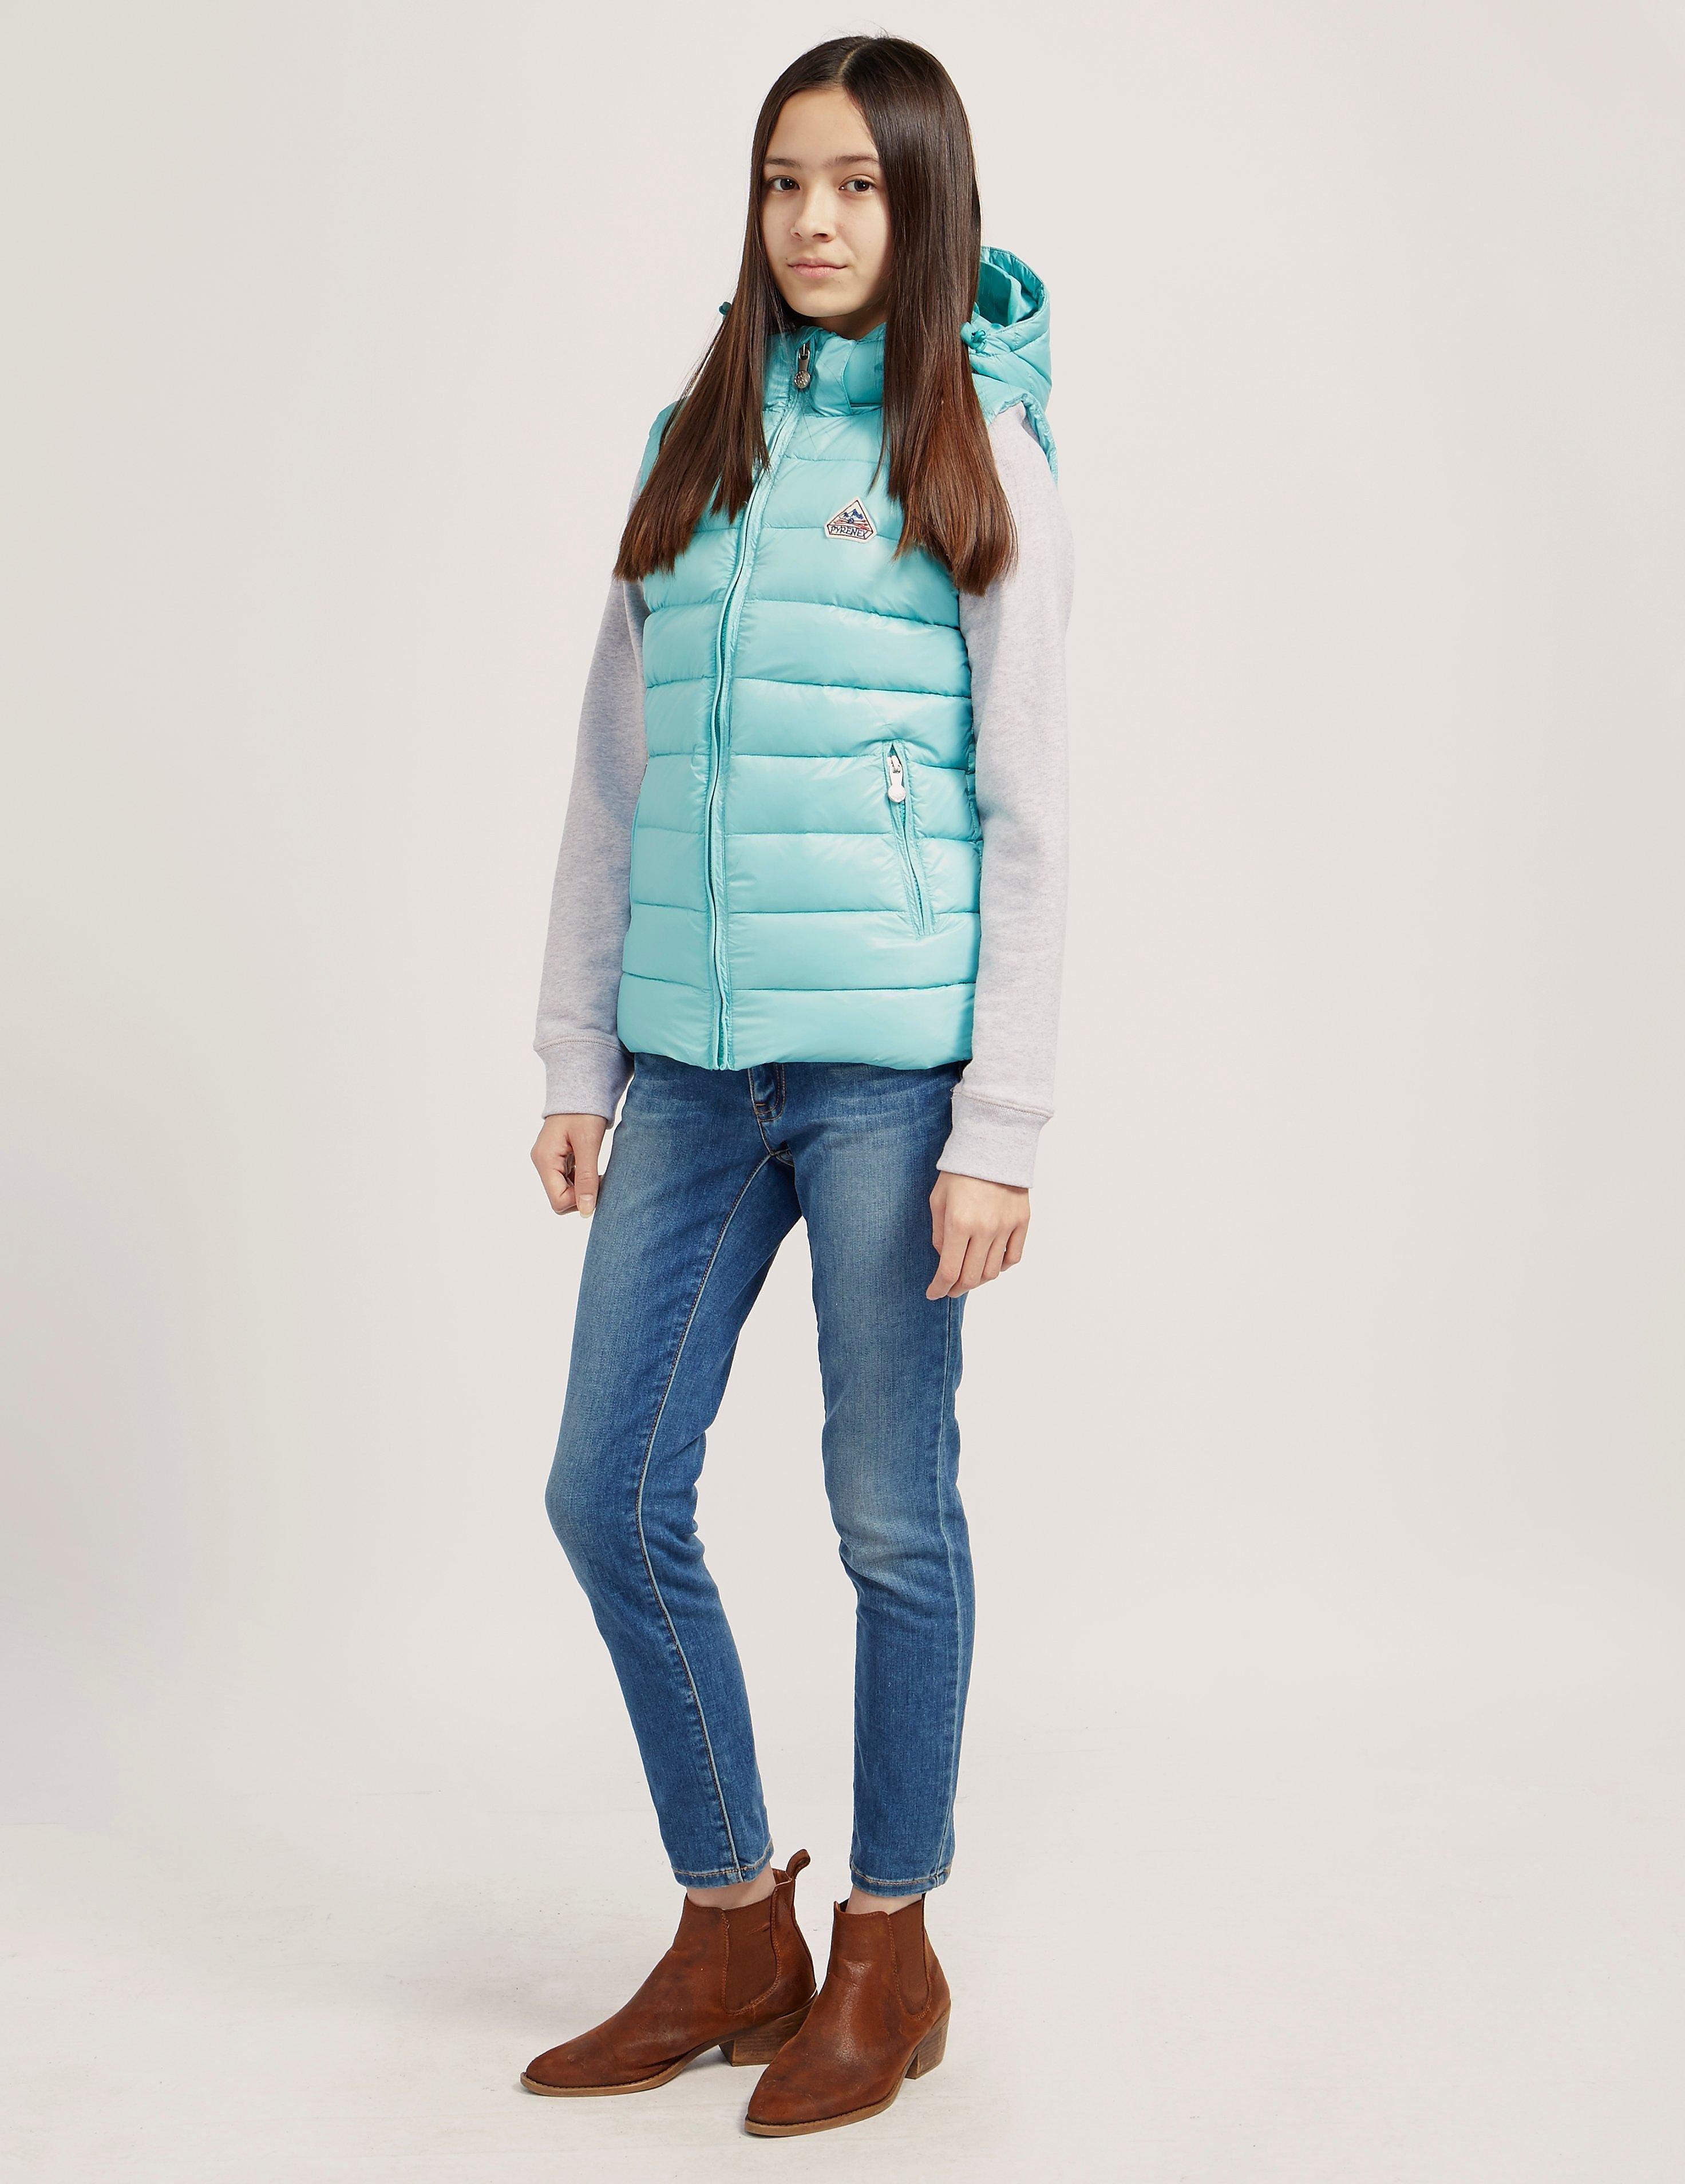 Pyrenex Sprout Shiny Vest